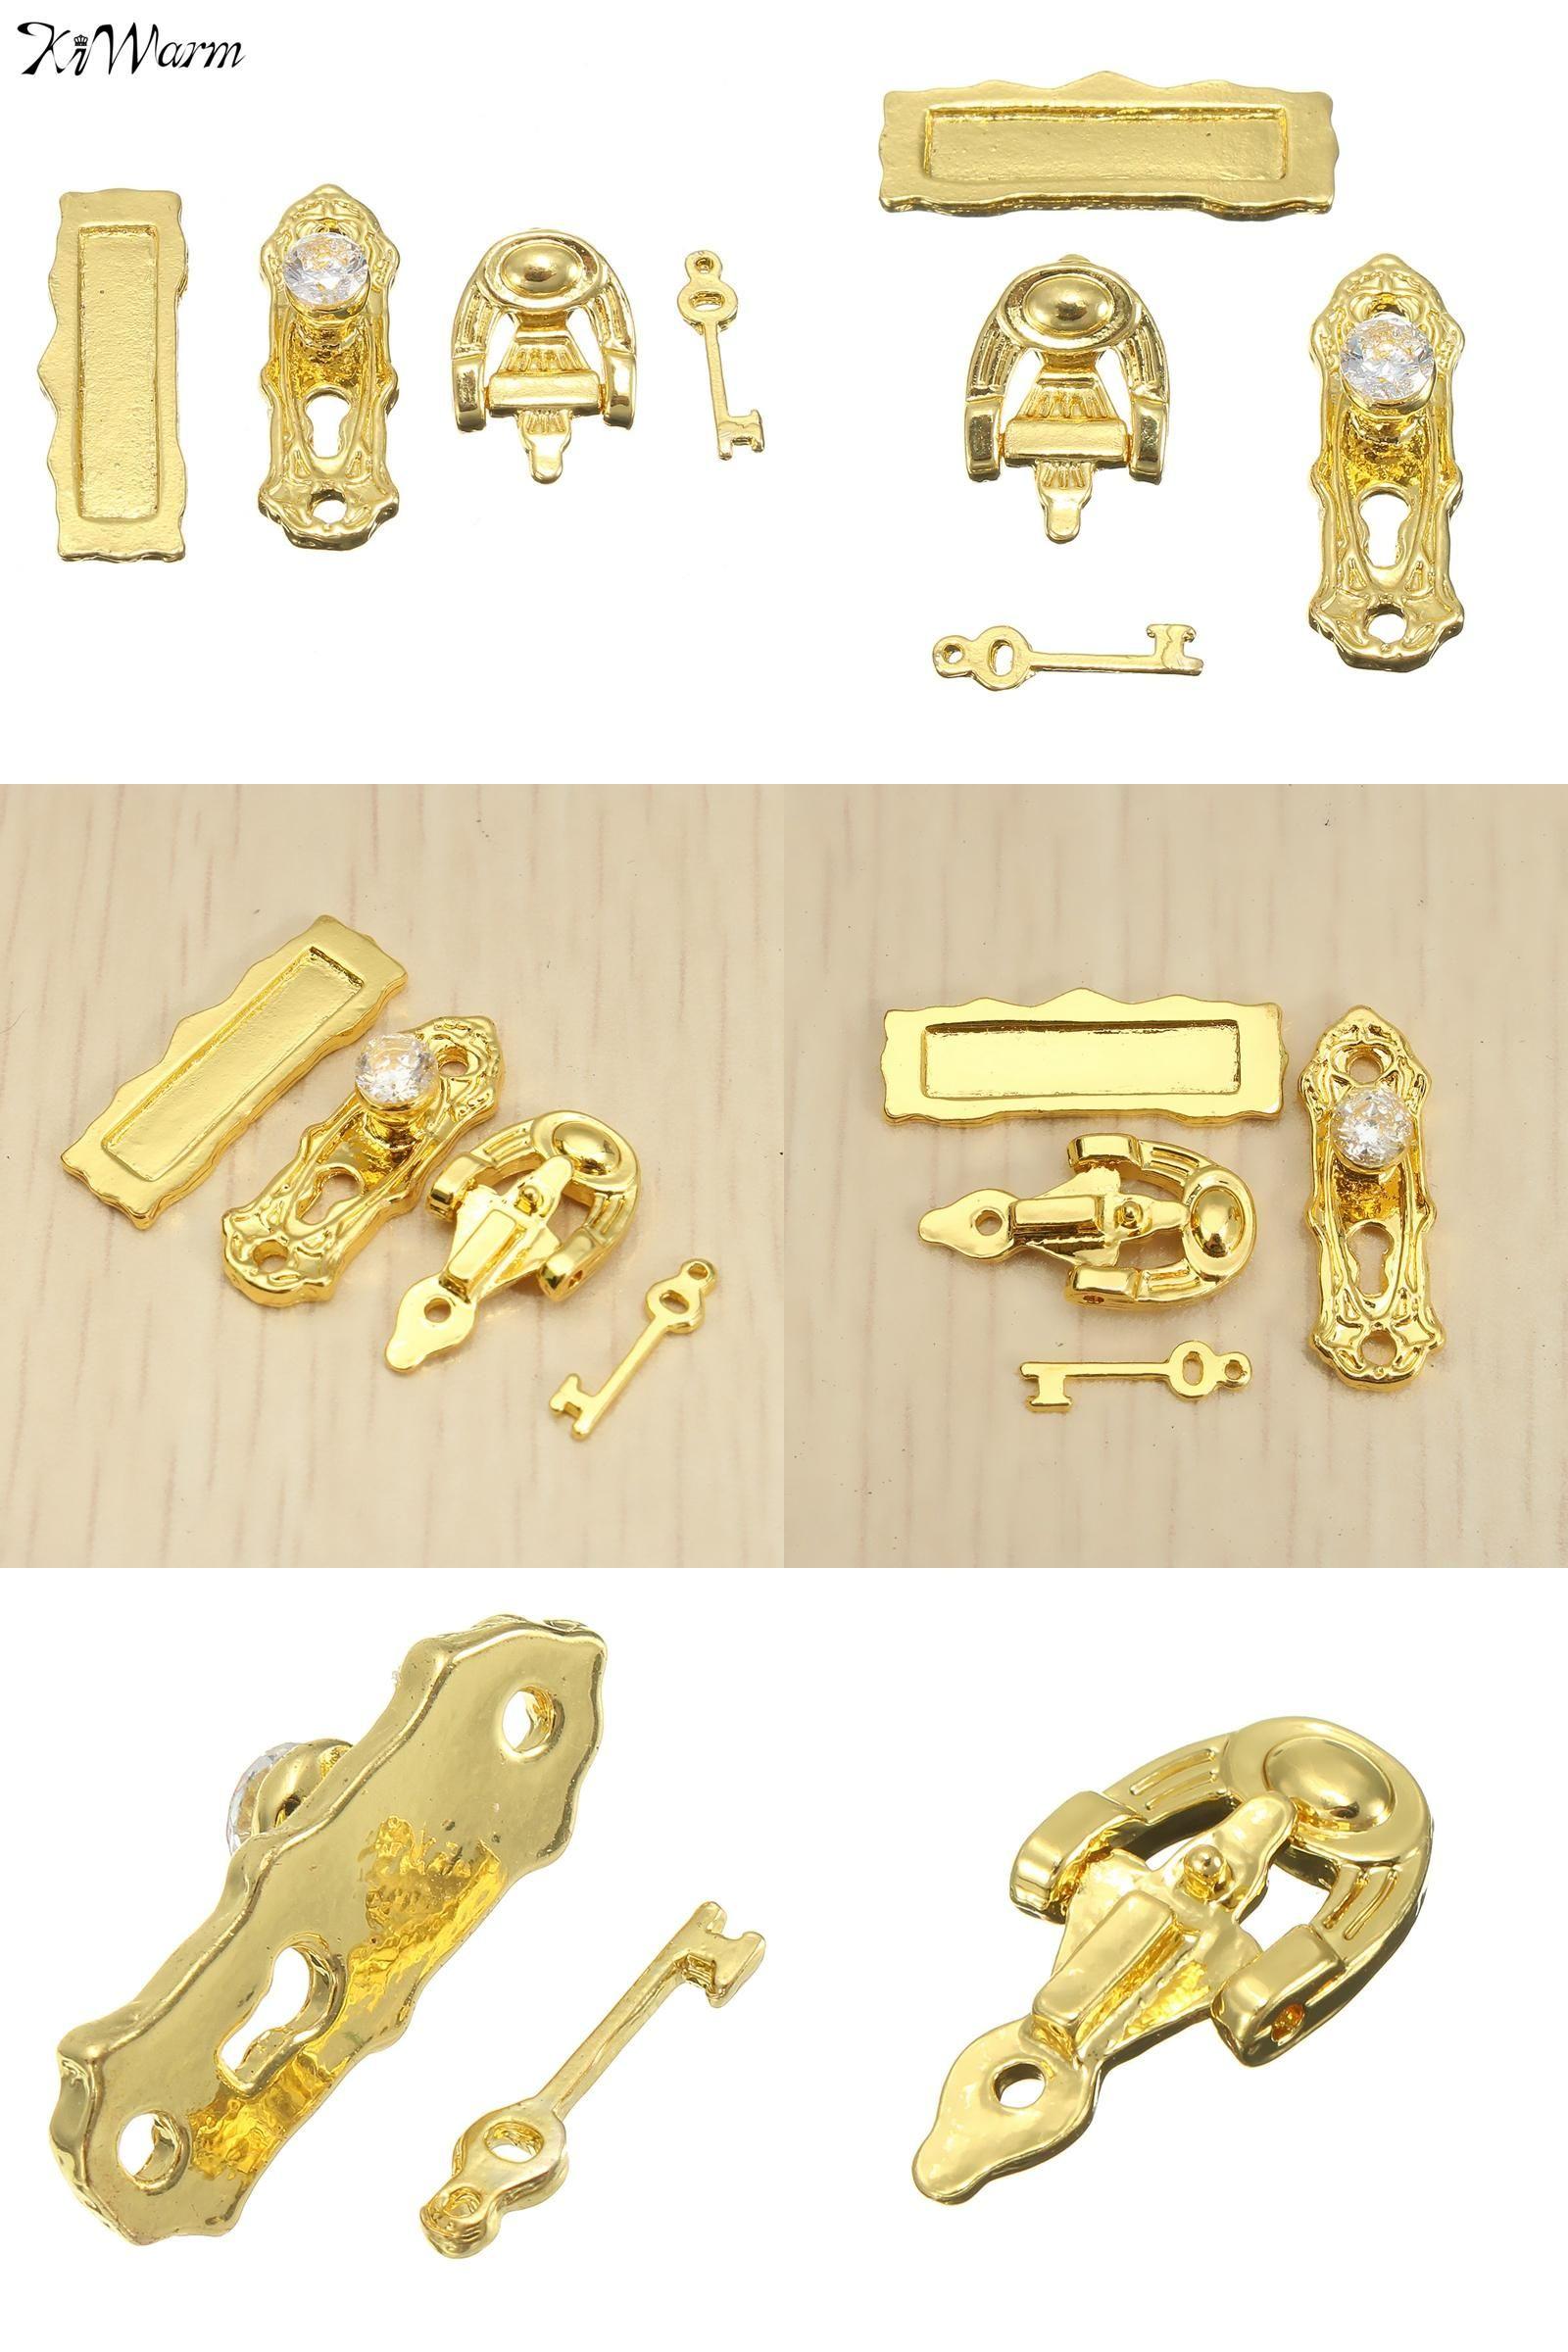 Visit to Buy] Fashion 4Pcs/set Miniature Ornament Doll house